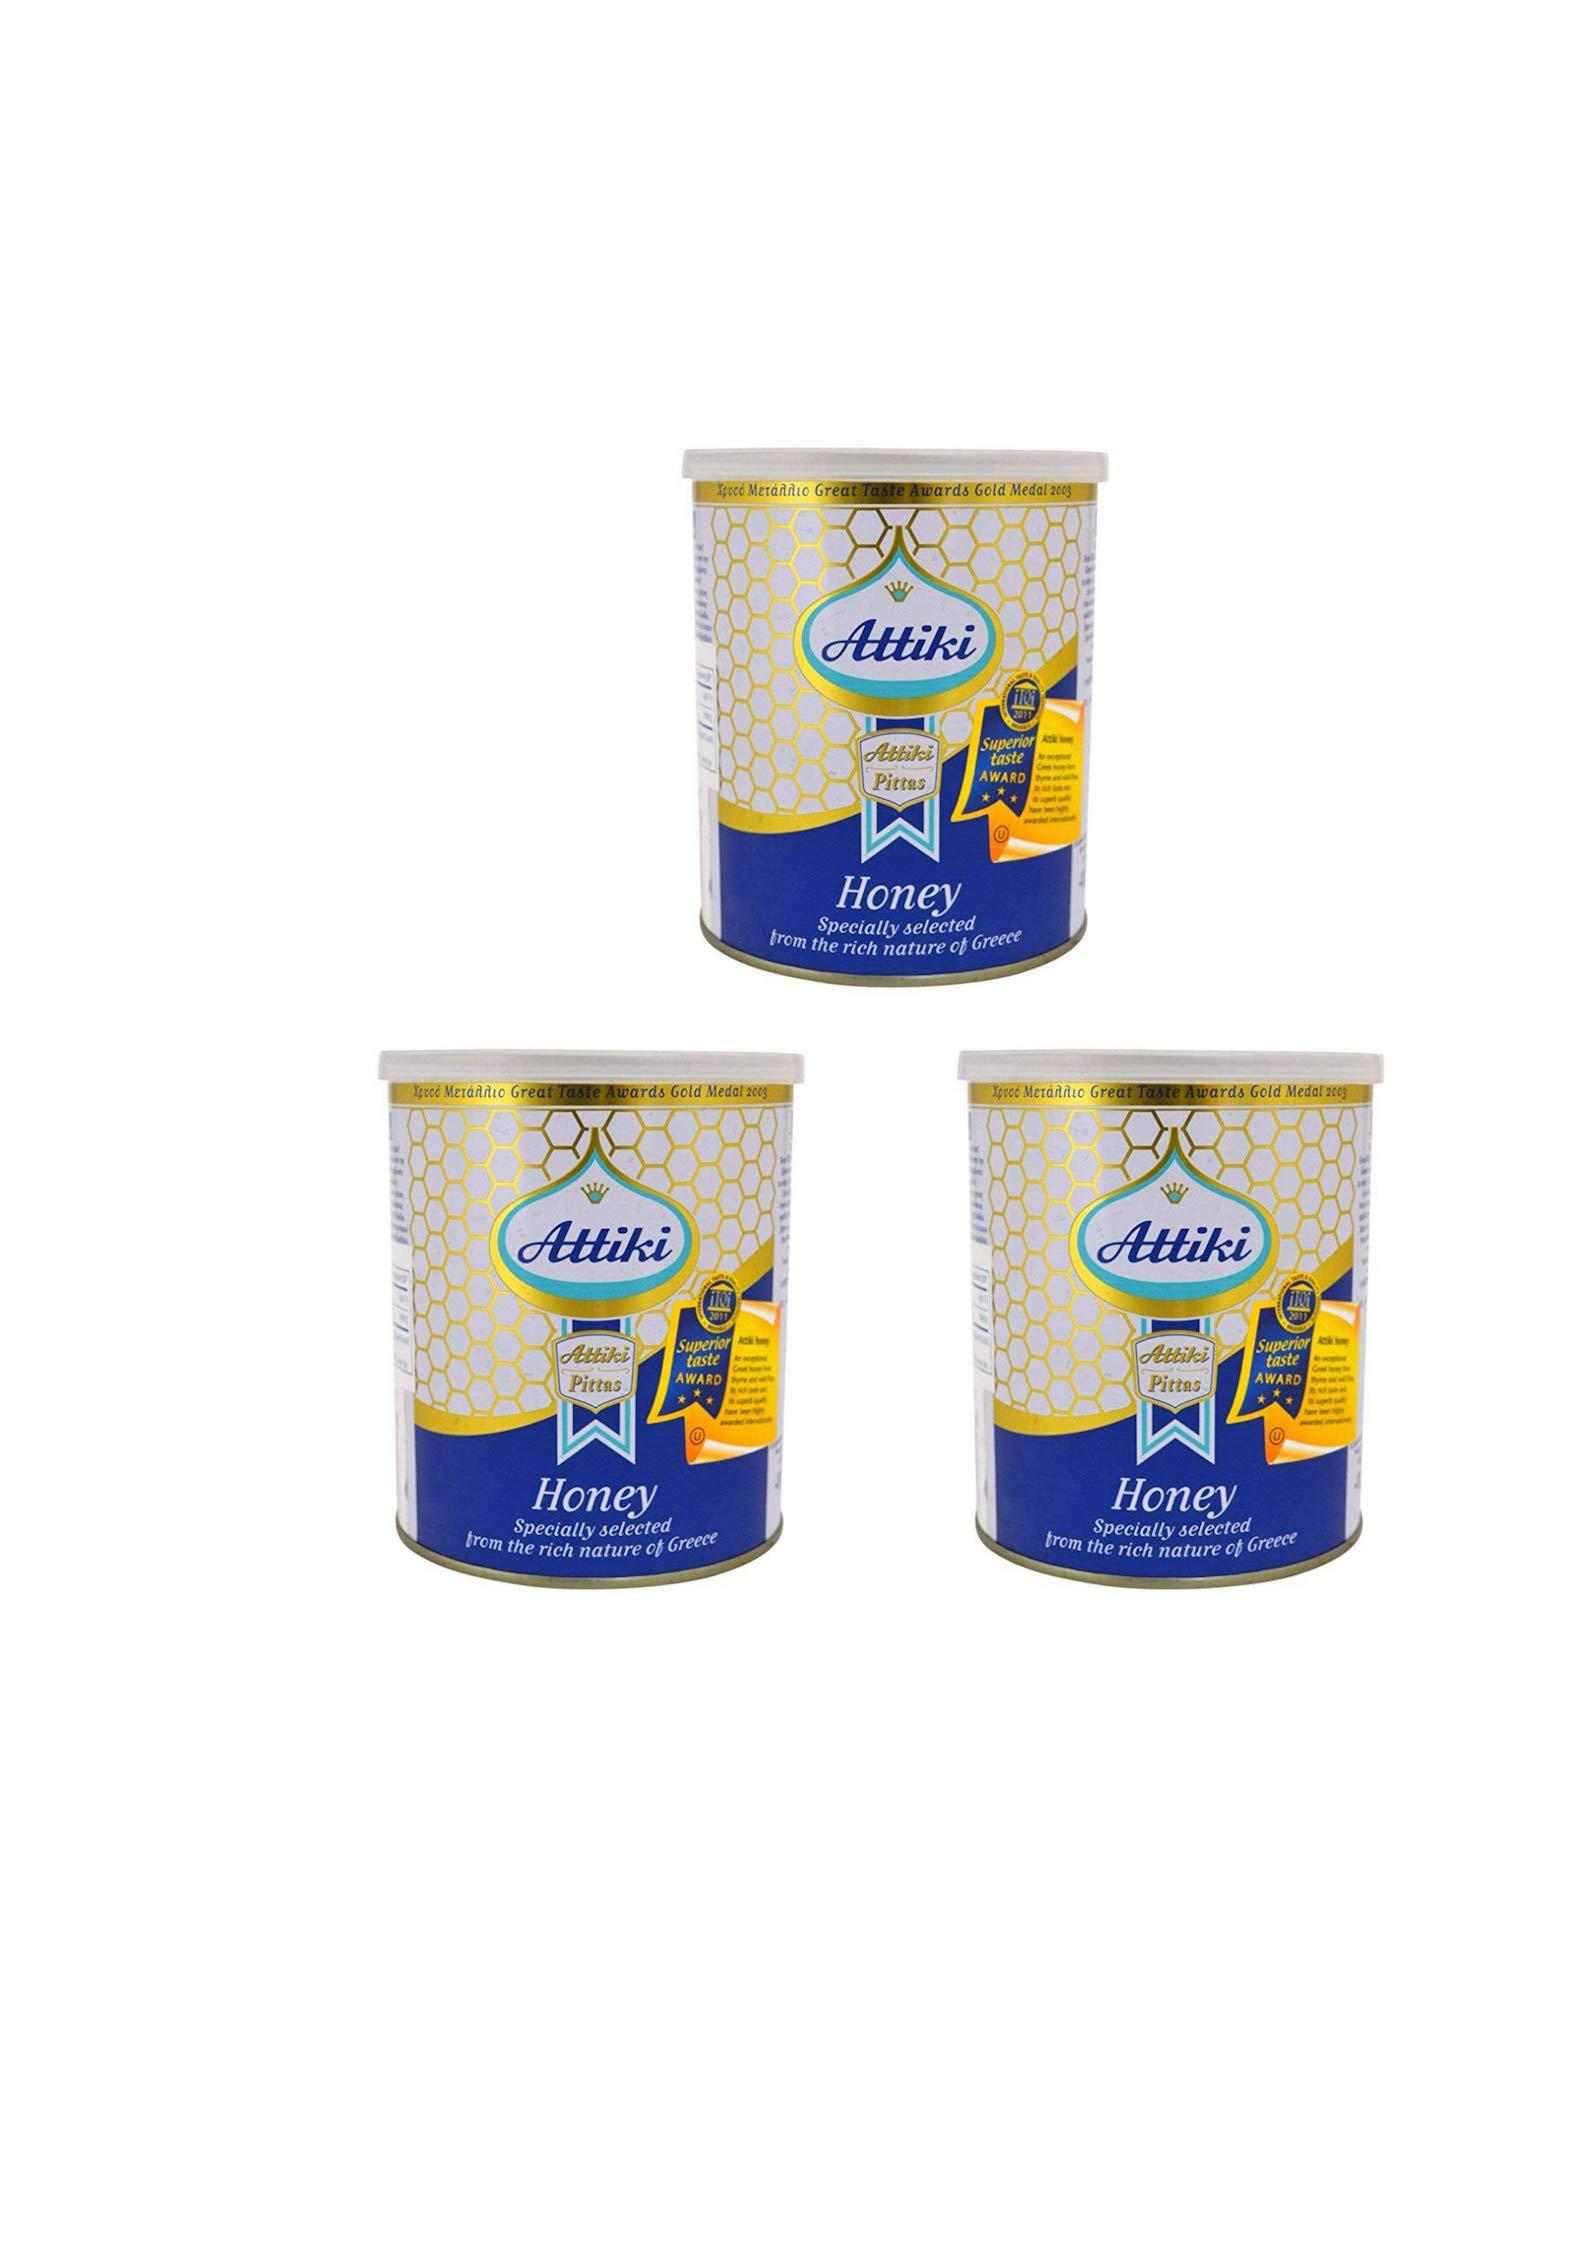 Attiki, Greek Honey 1000g (2.2lb) CAN (3 pack)